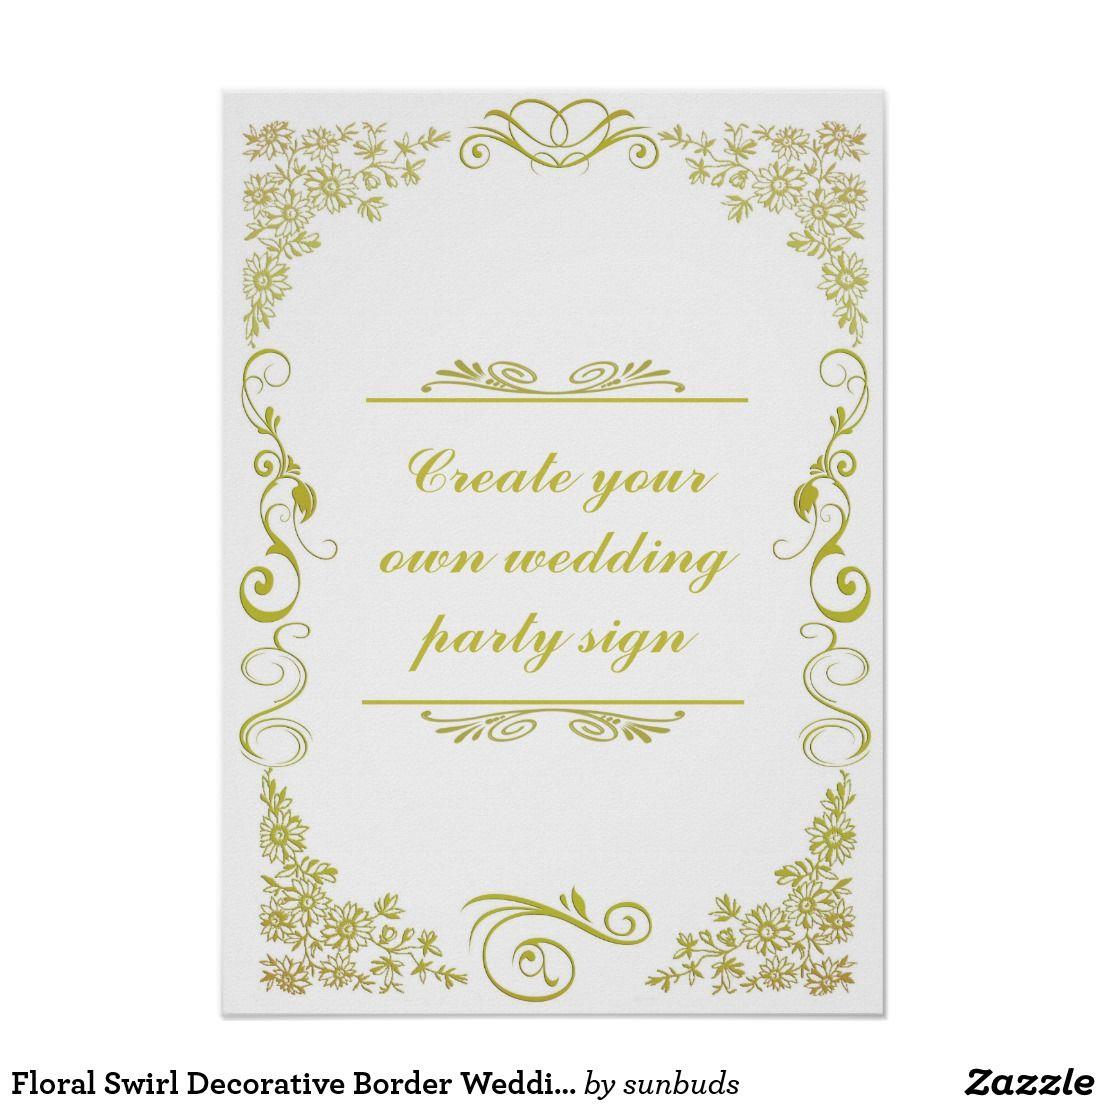 Floral Swirl Decorative Border Wedding Party Sign Zazzle